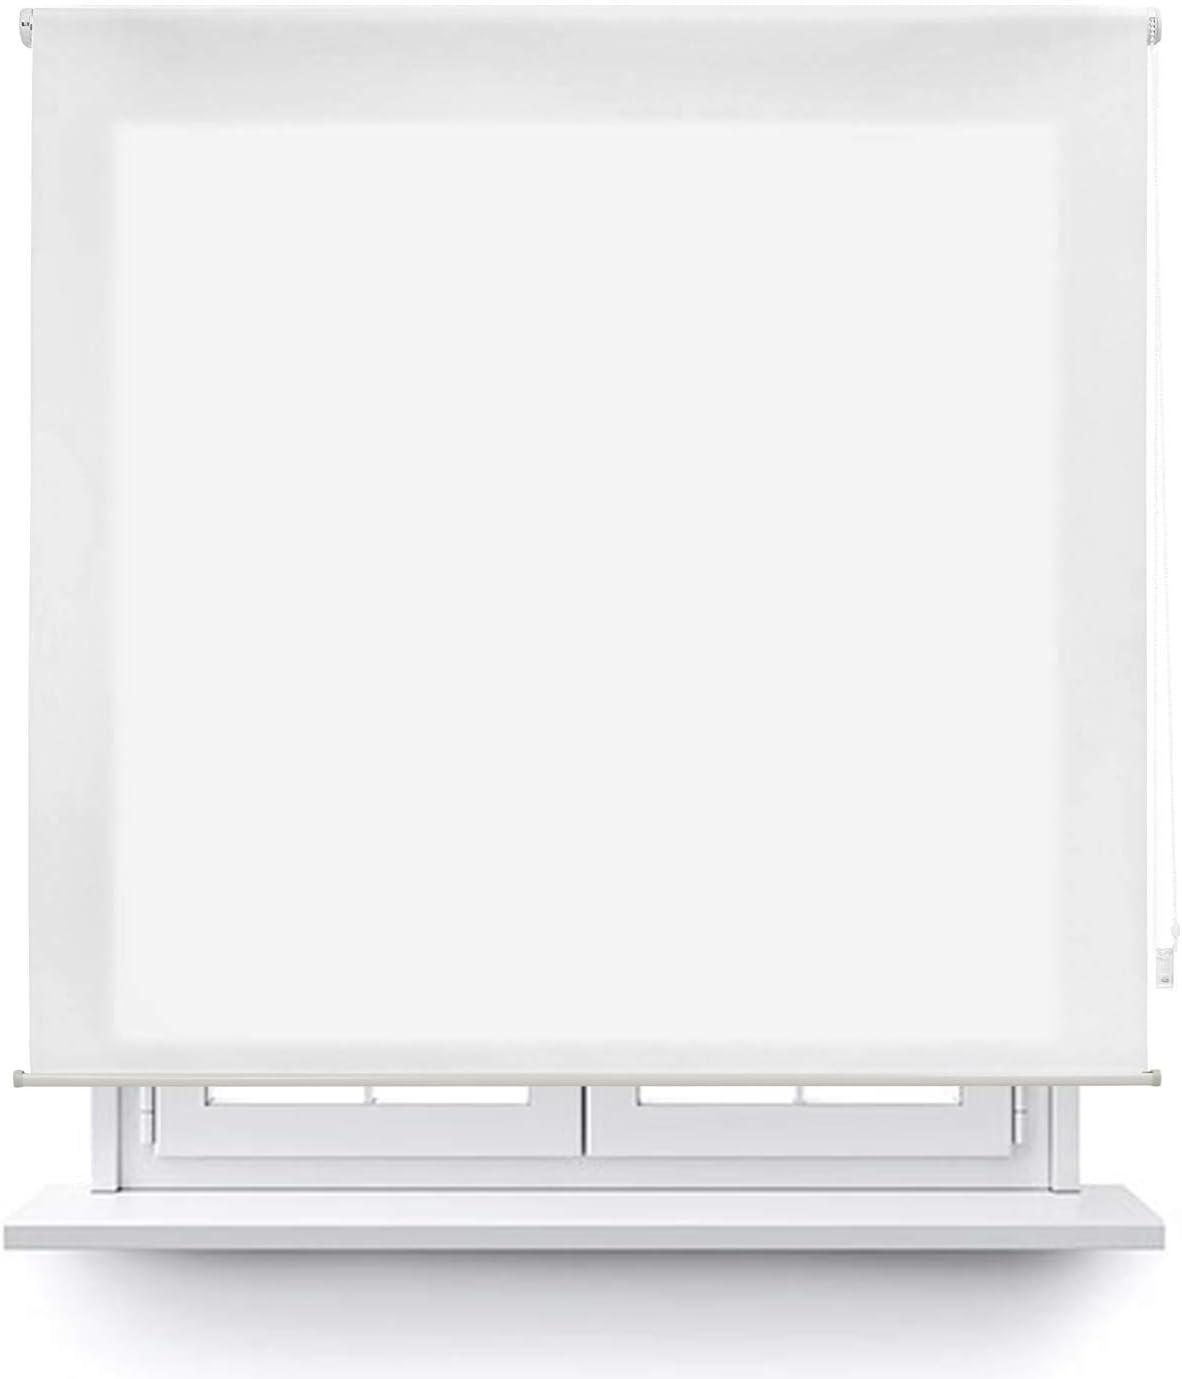 MERCURY TEXTIL Estor Enrollable translúcido Liso (Blanco, 135x180cm)